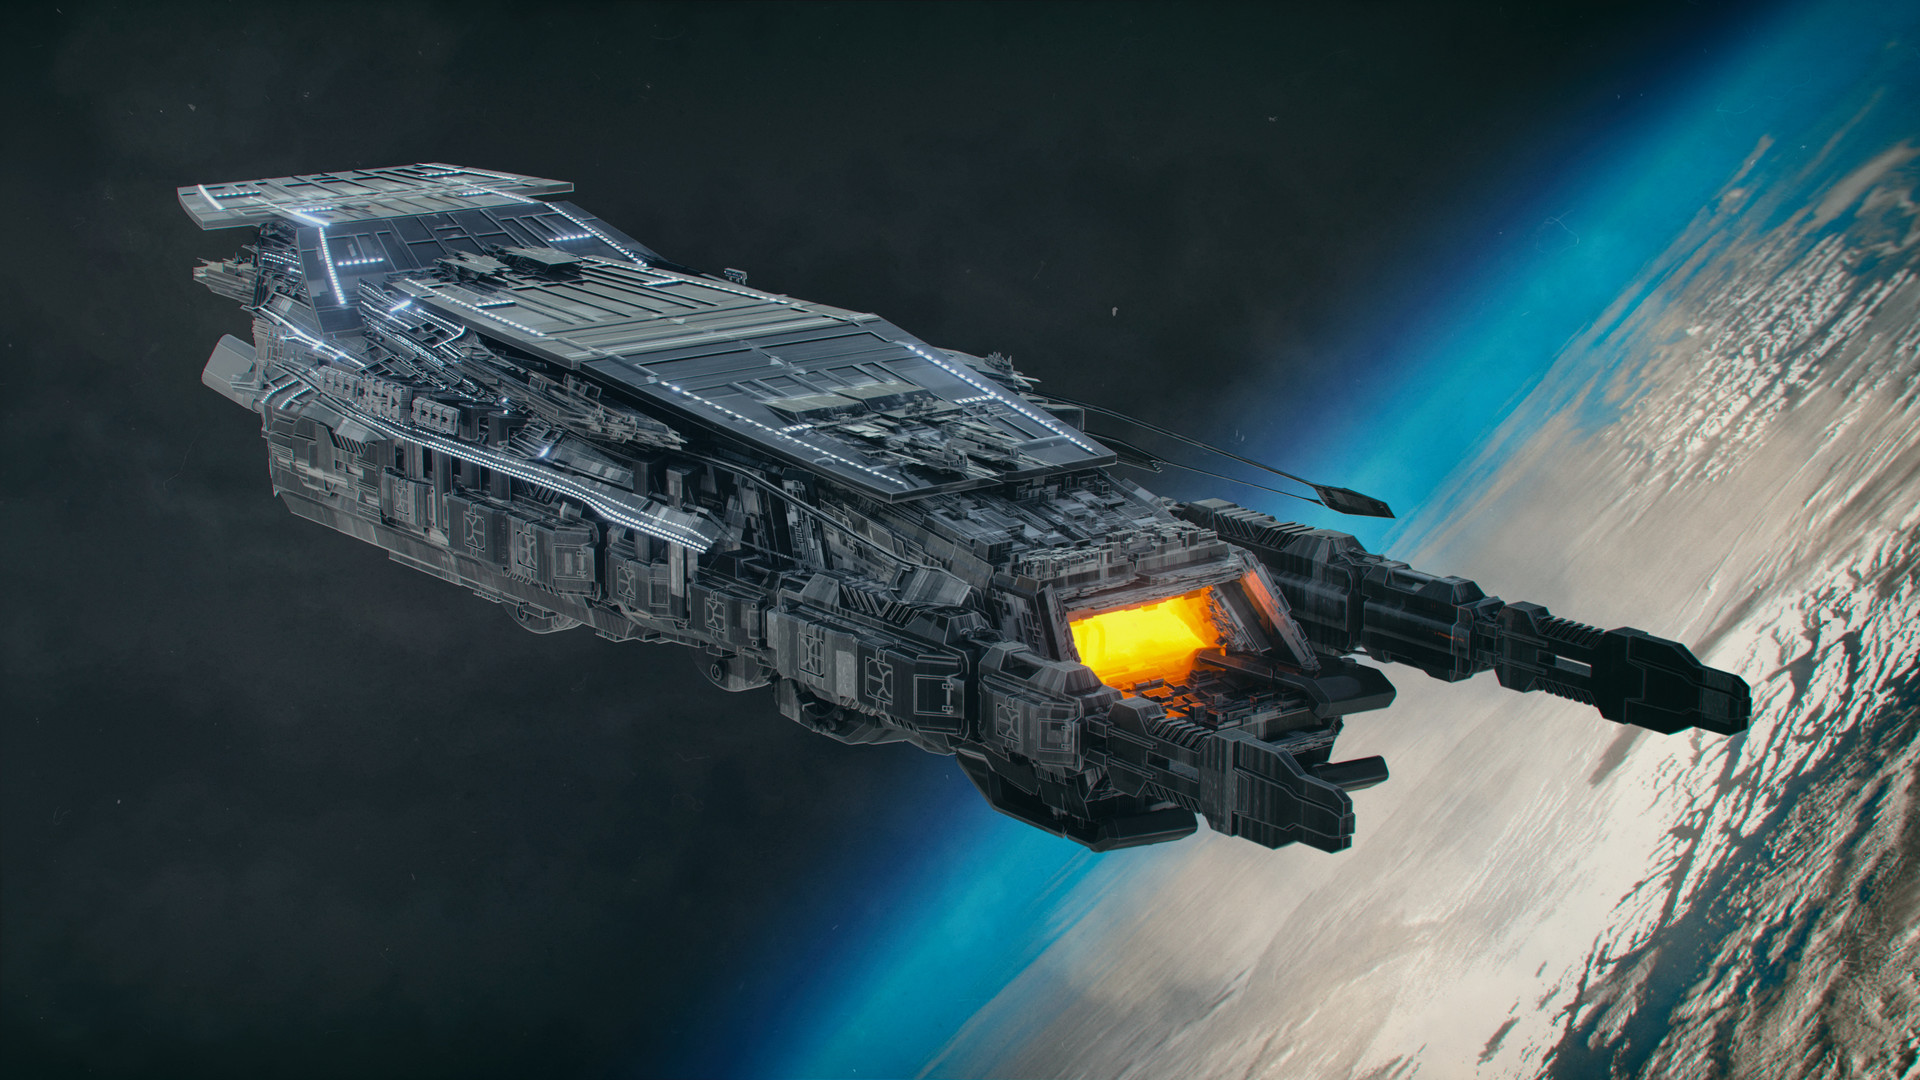 Kresimir jelusic robob3ar 166 230316 carrier